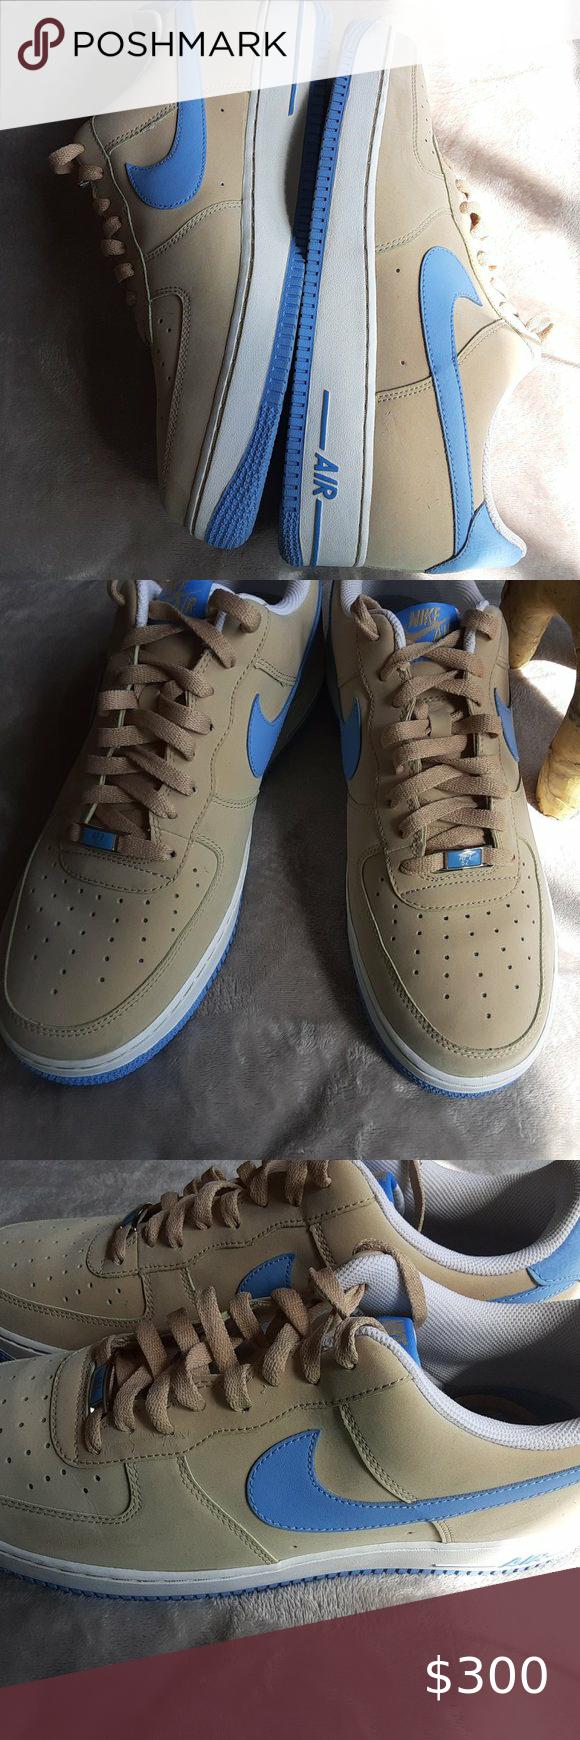 Nike Air Force 1 Linen University Blue